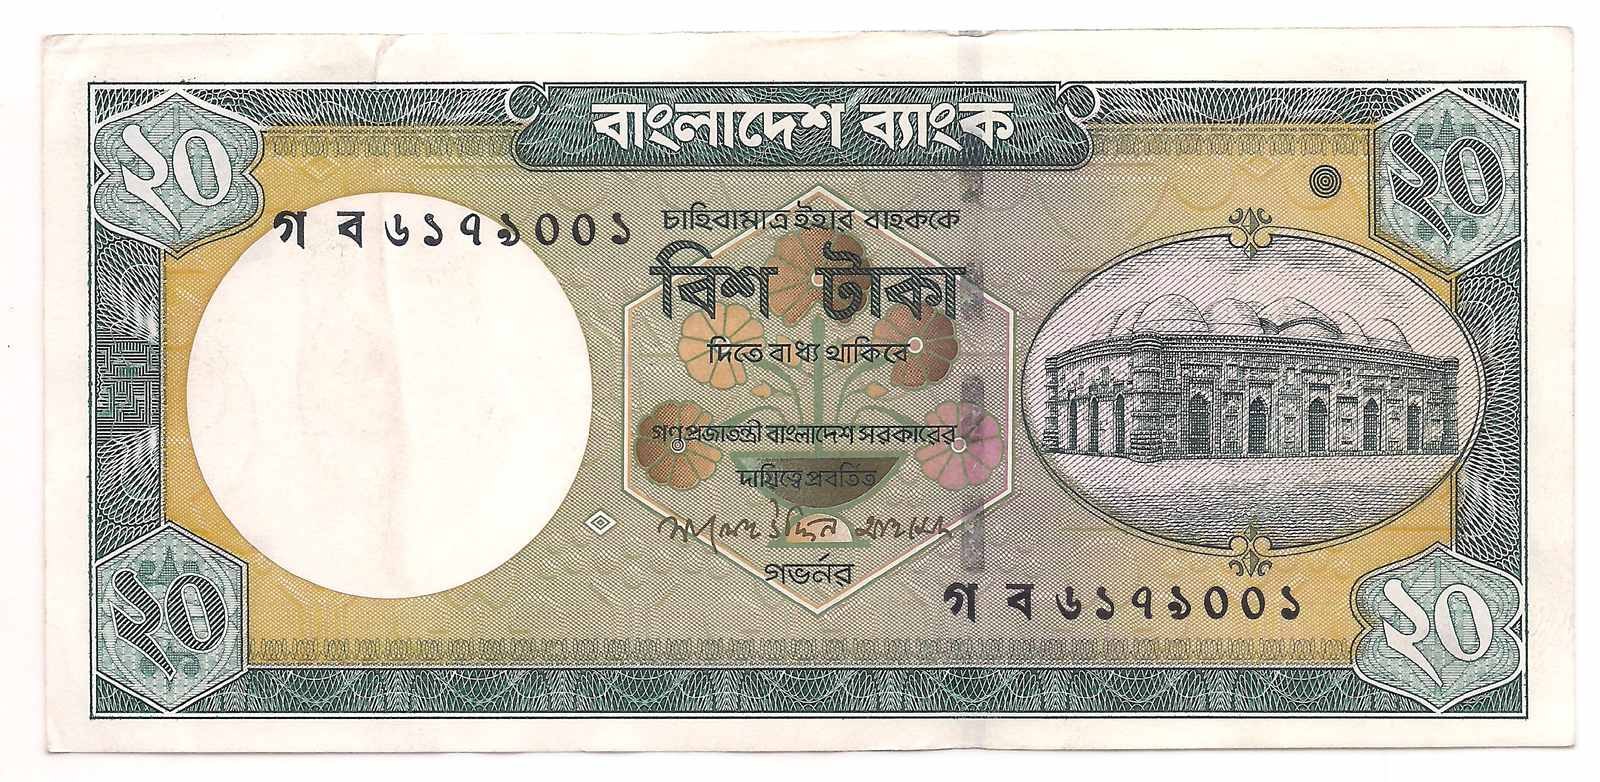 Bangladesh 20 Taka 2006 - FE